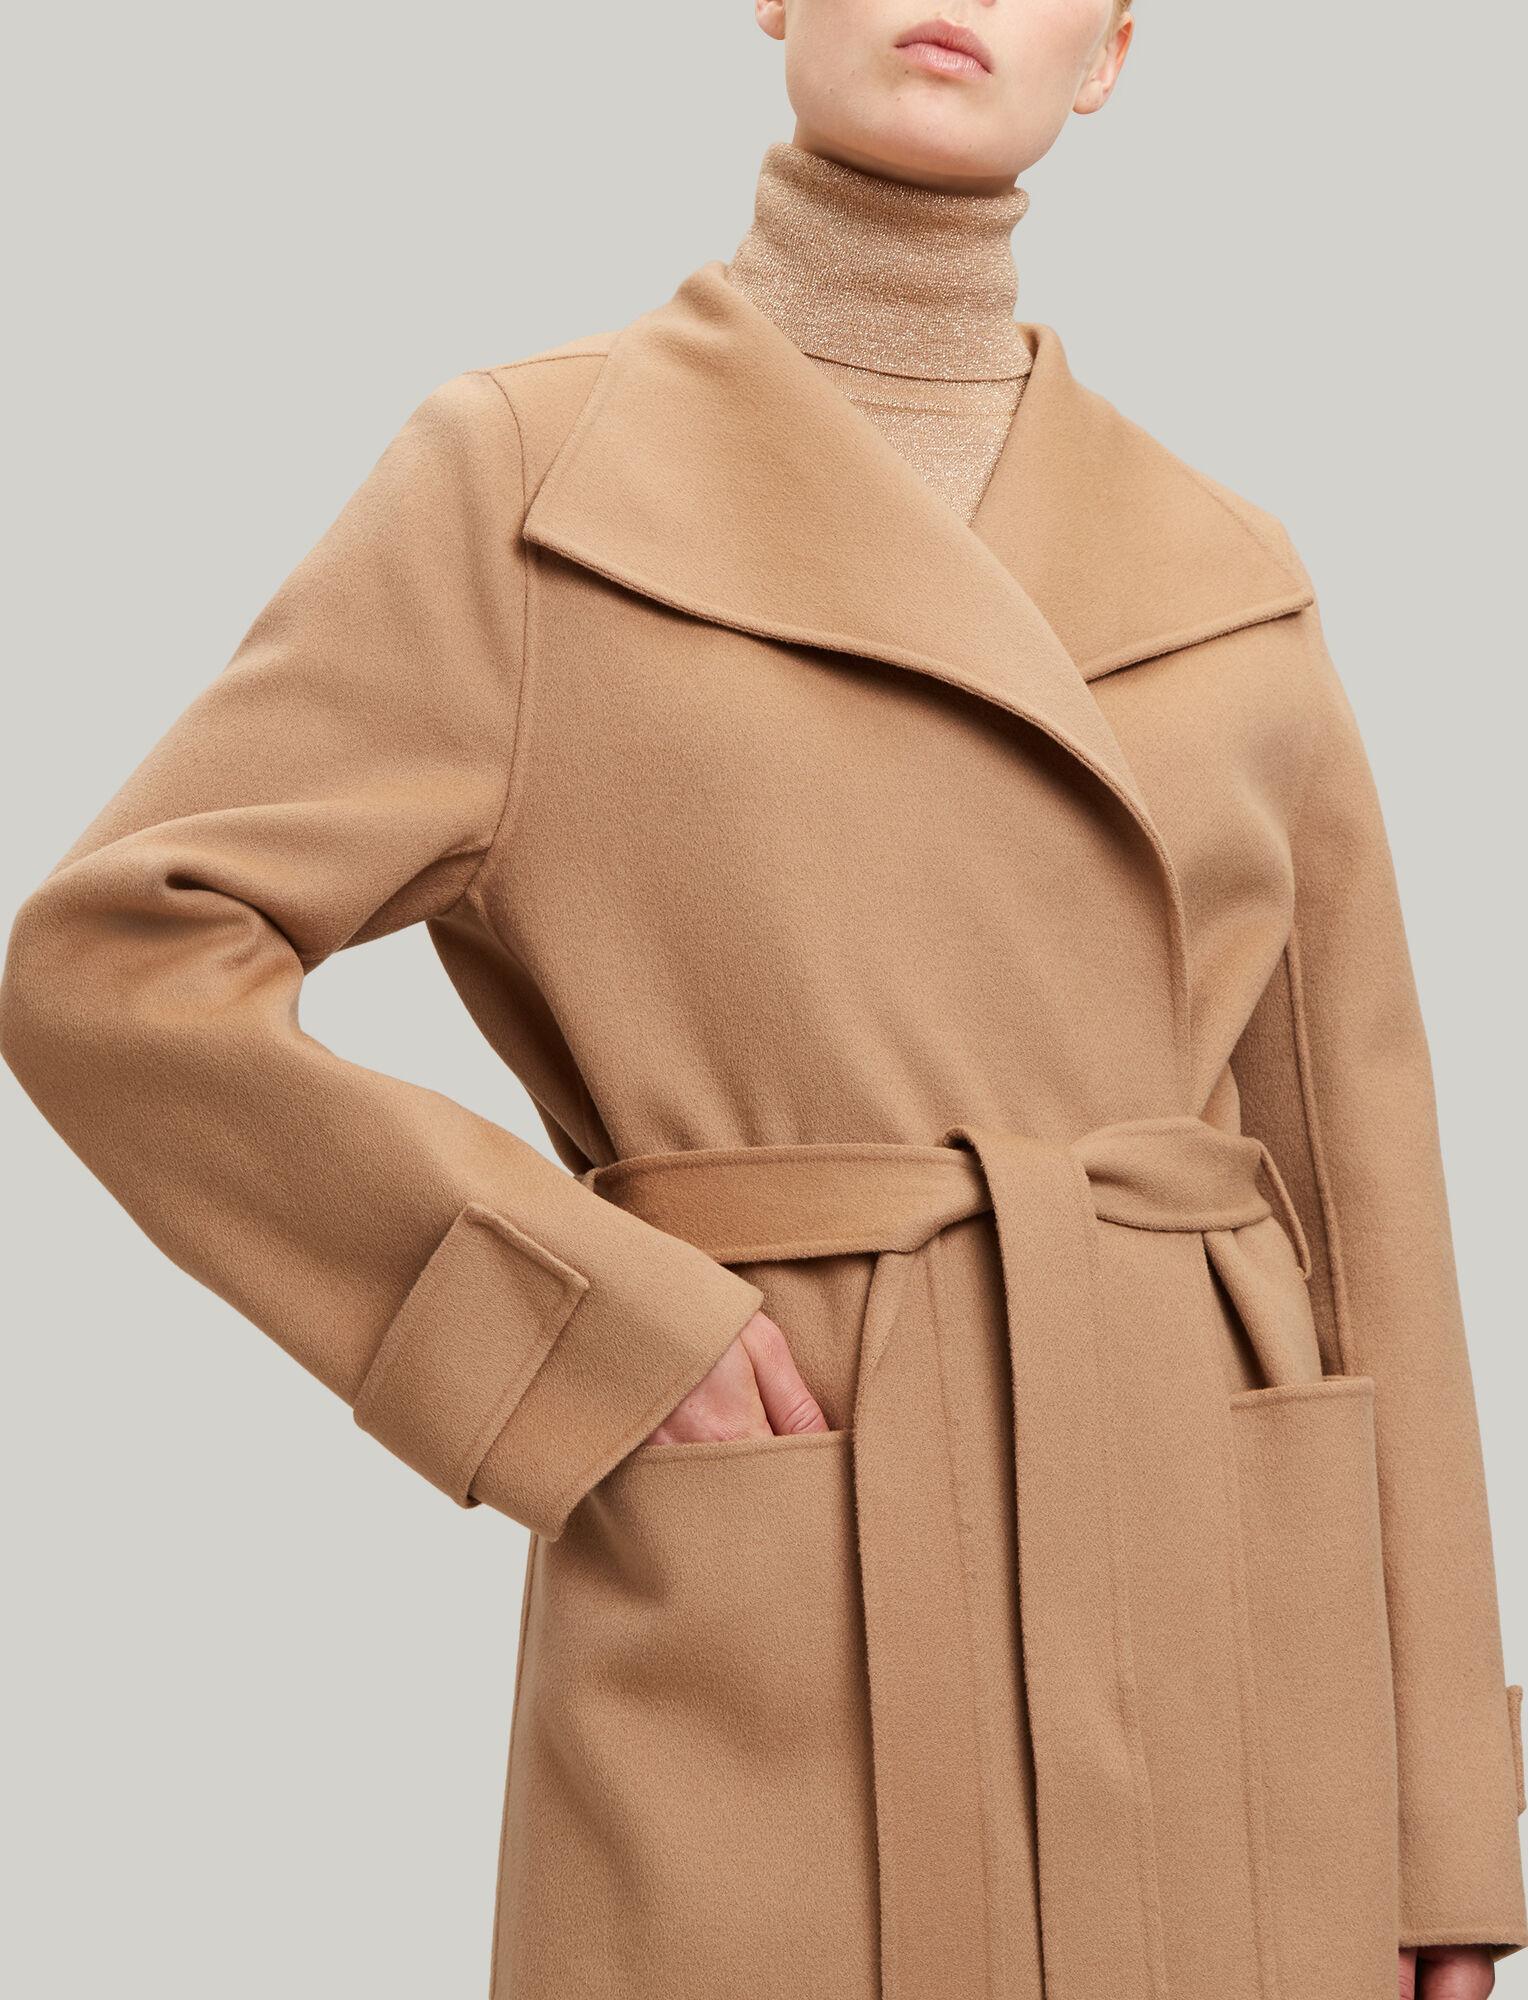 a9732fdd28c ... Joseph, Lista Short Double Wool Gloss Coat, in CAMEL